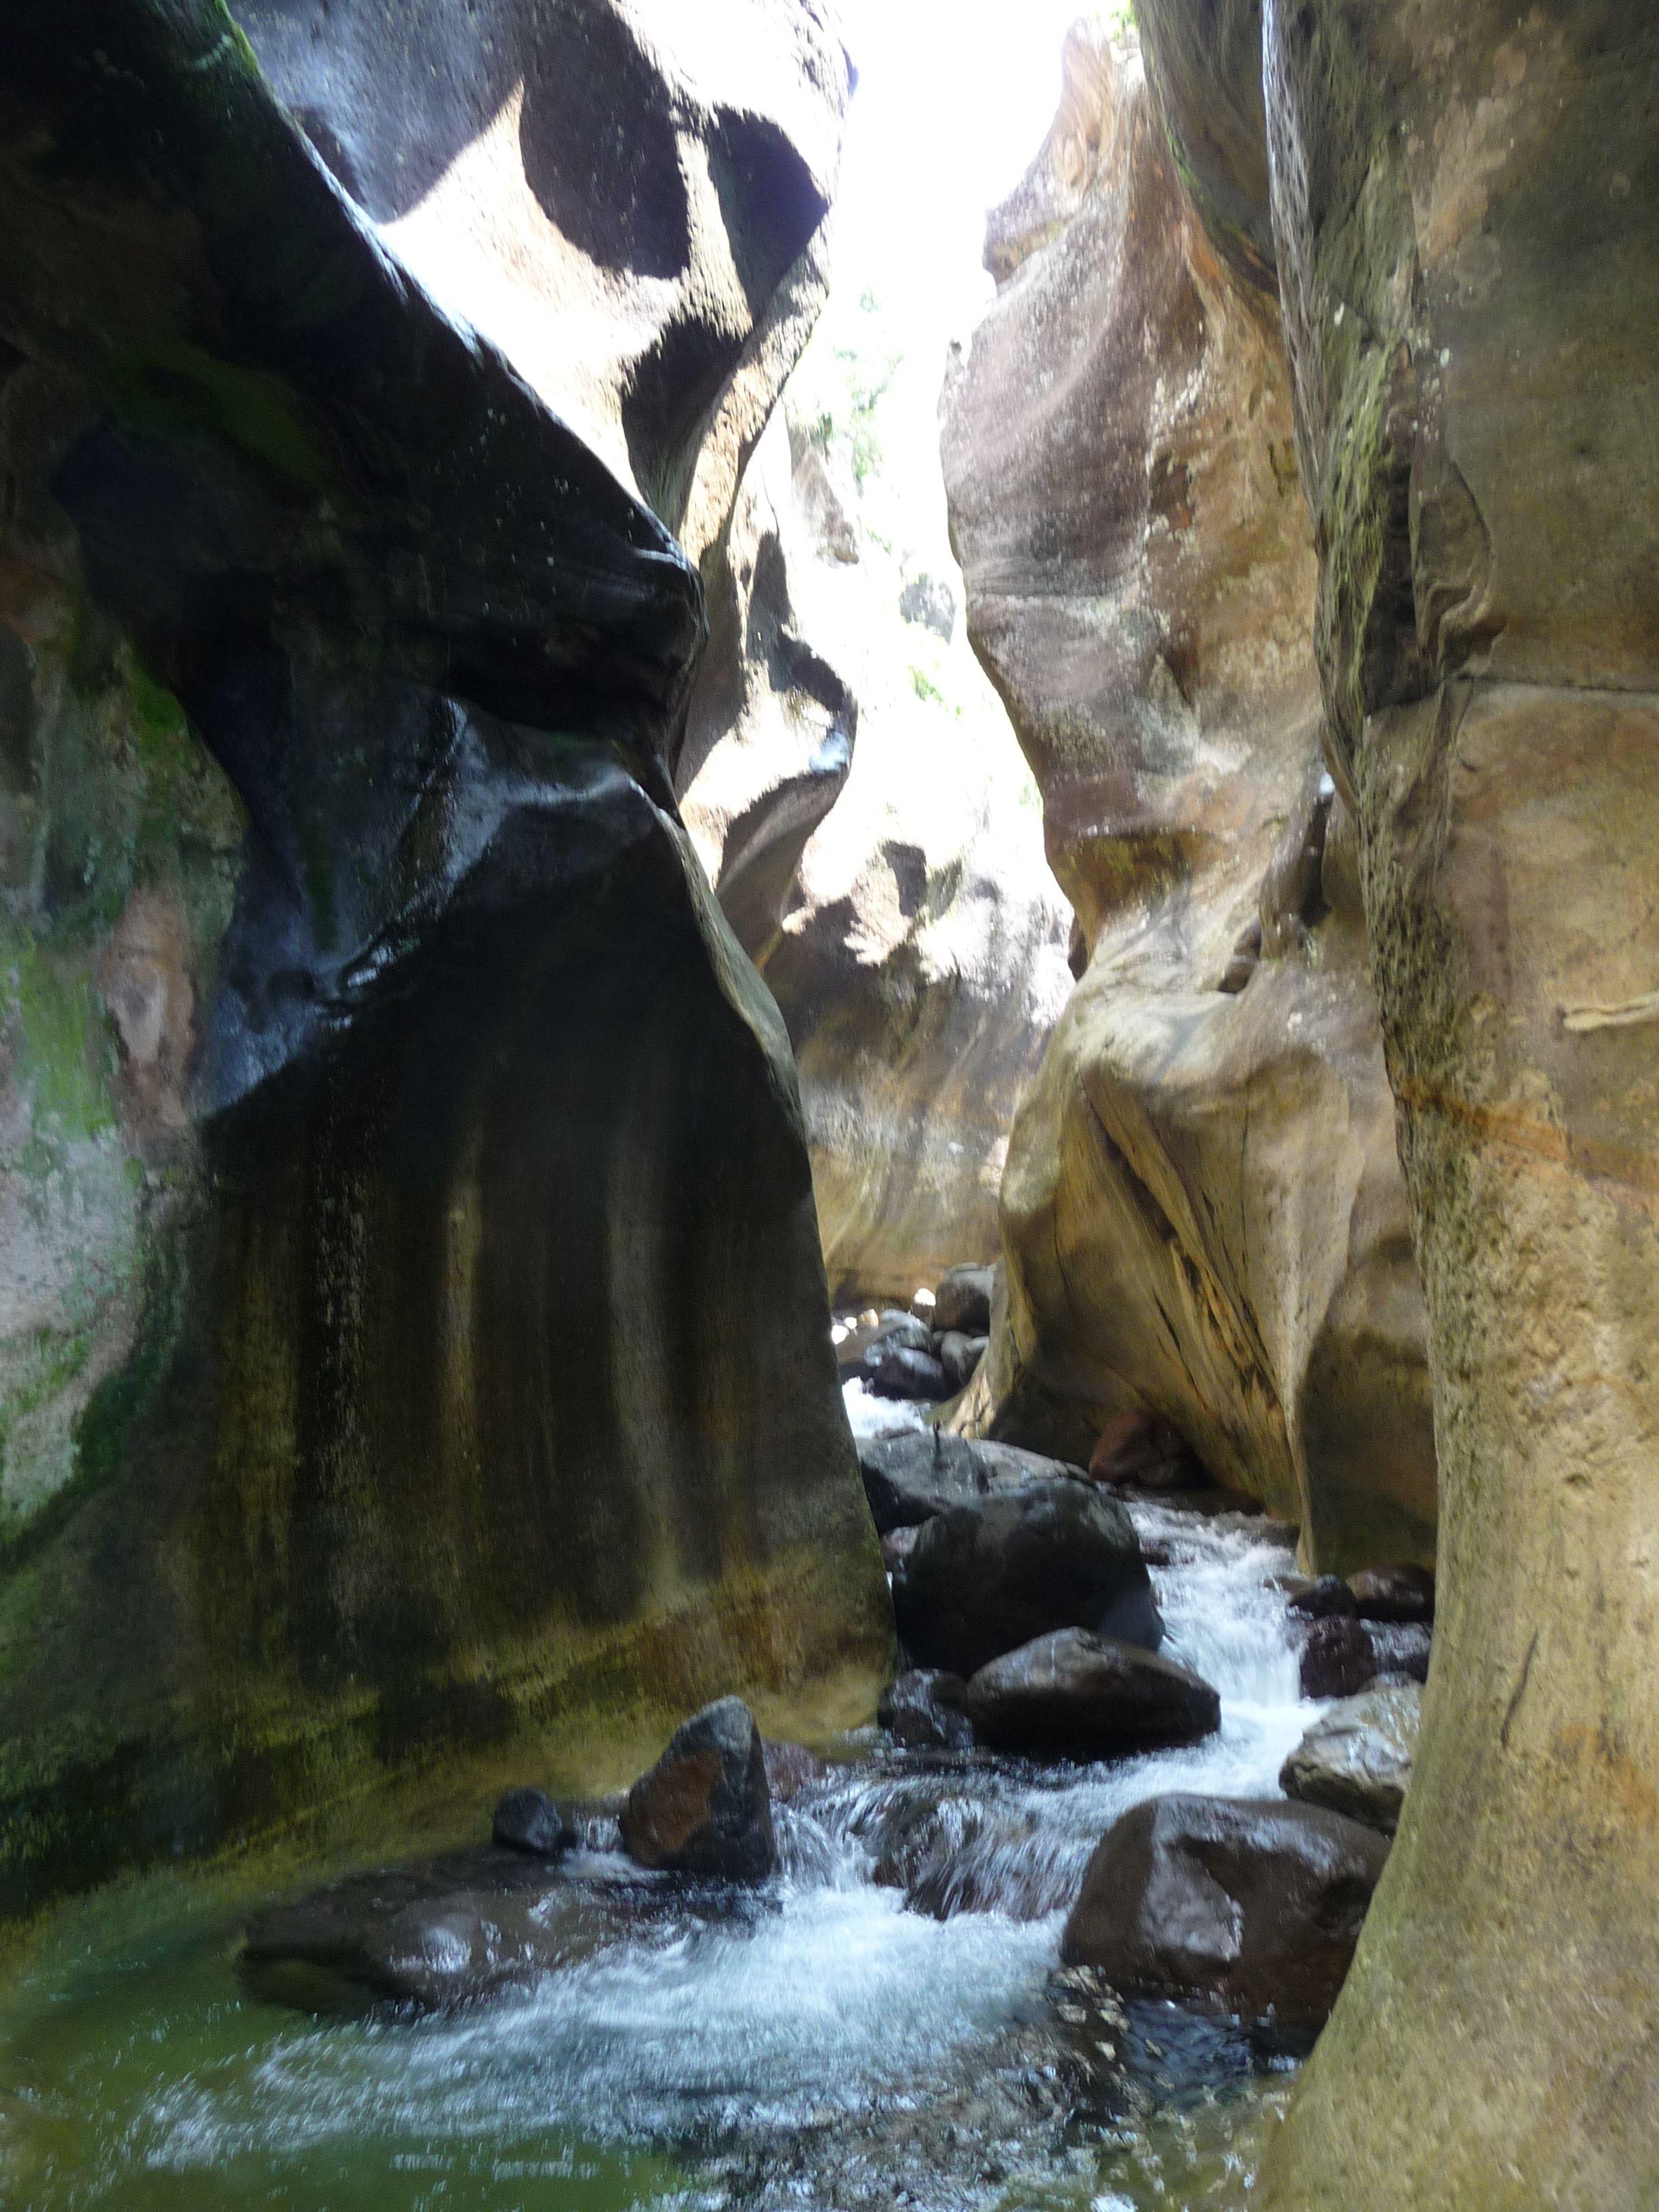 Tugela Gorge, Royal Natal. http://www.n3gateway.com/the-n3-gateway-route/ezemvelo-kzn-wildlife-royal-natal-national-park.htm